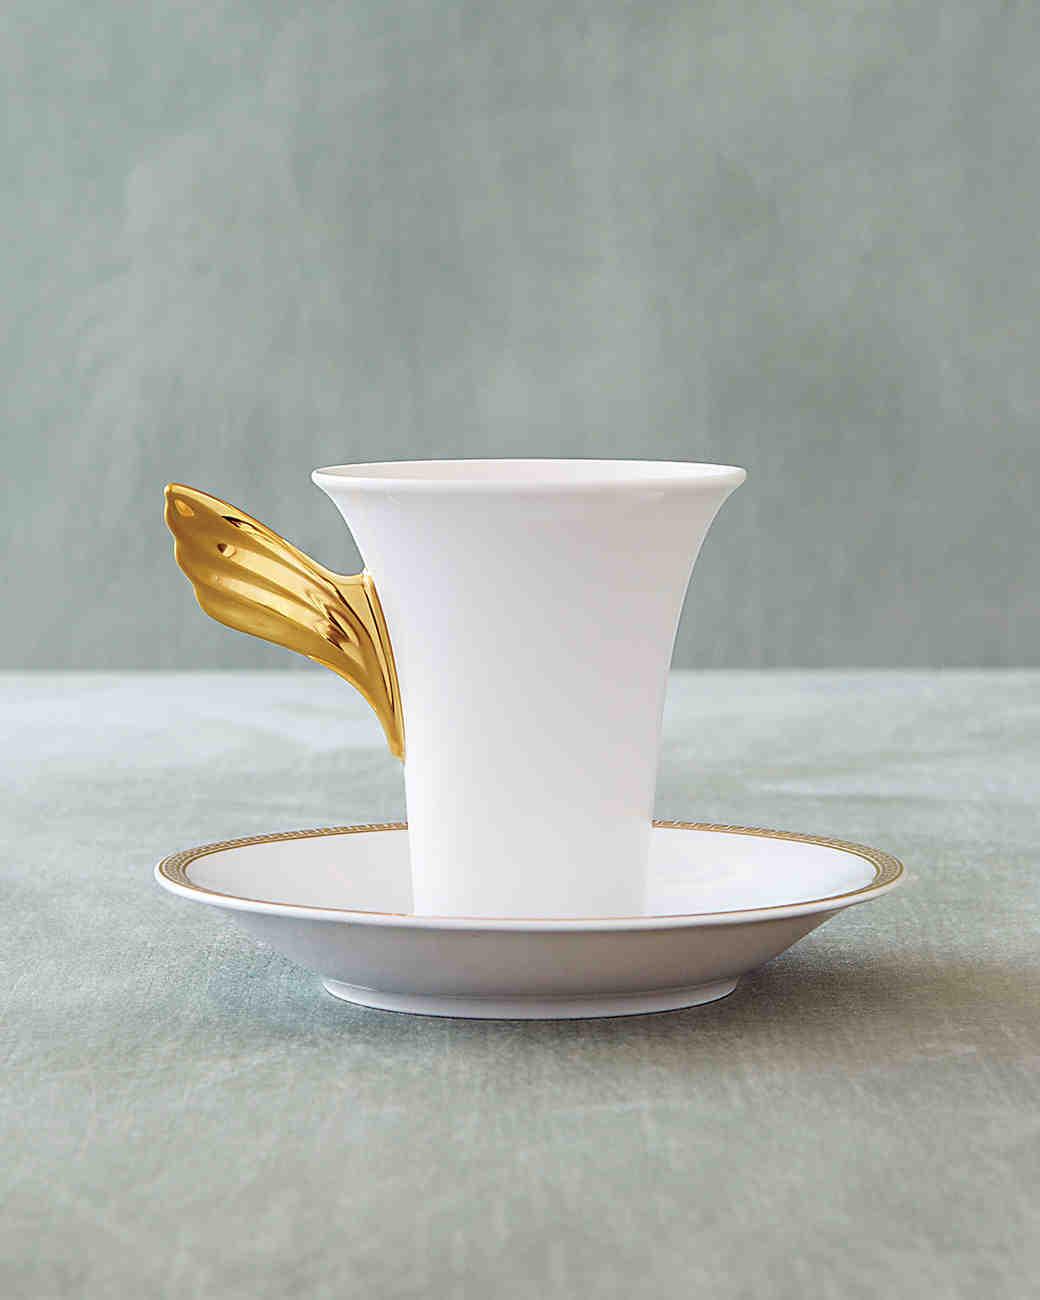 high-cup-saucer-0811mwd107434.jpg